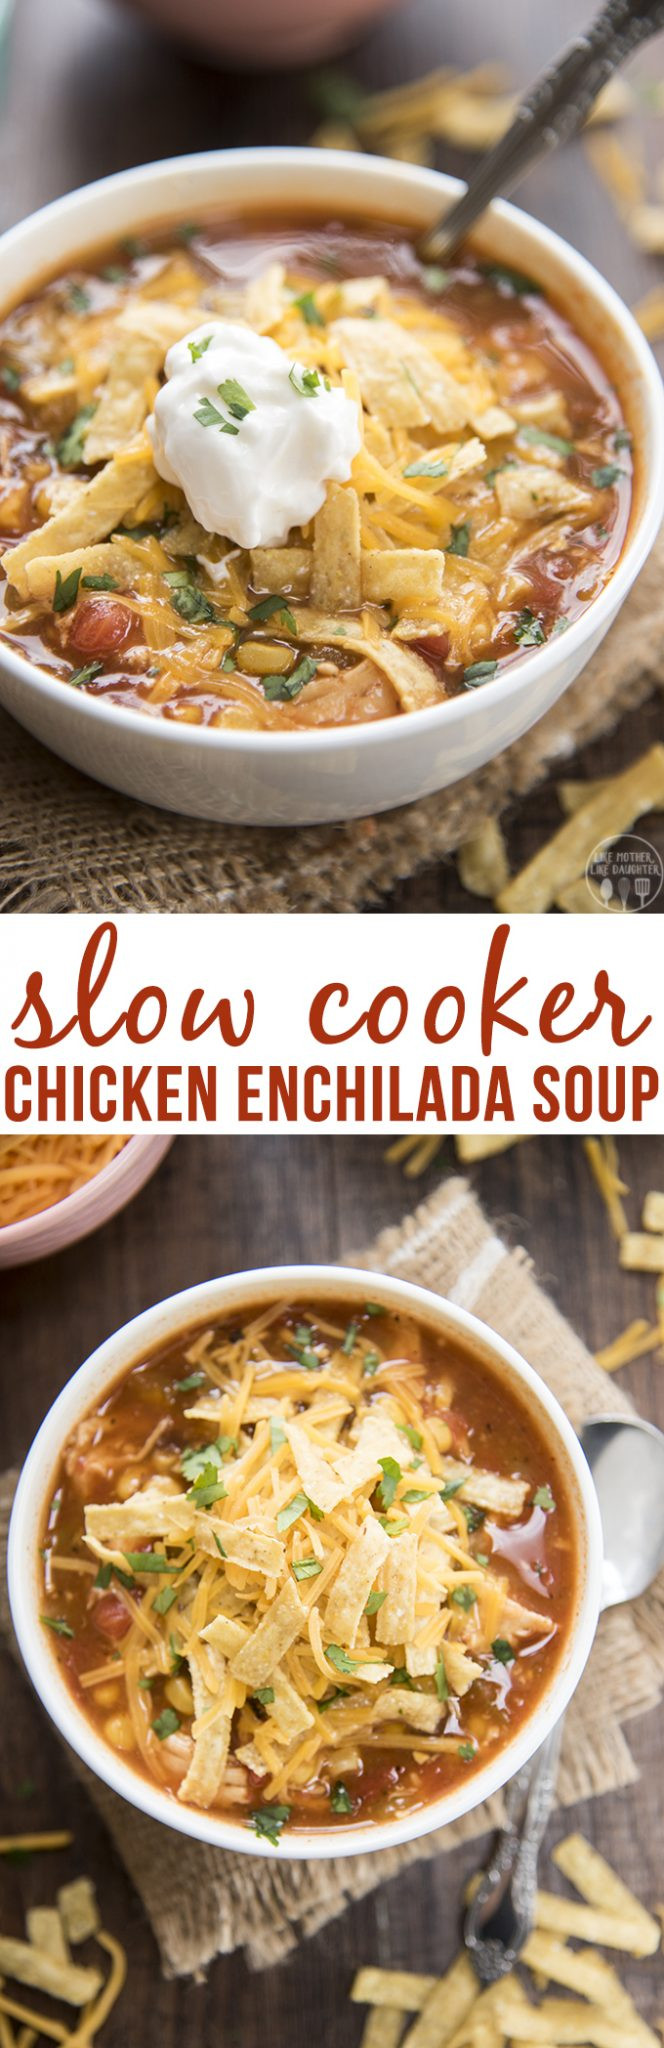 Slow Cooker Chicken Enchilada Soup  Slow Cooker Chicken Enchilada Soup Like Mother Like